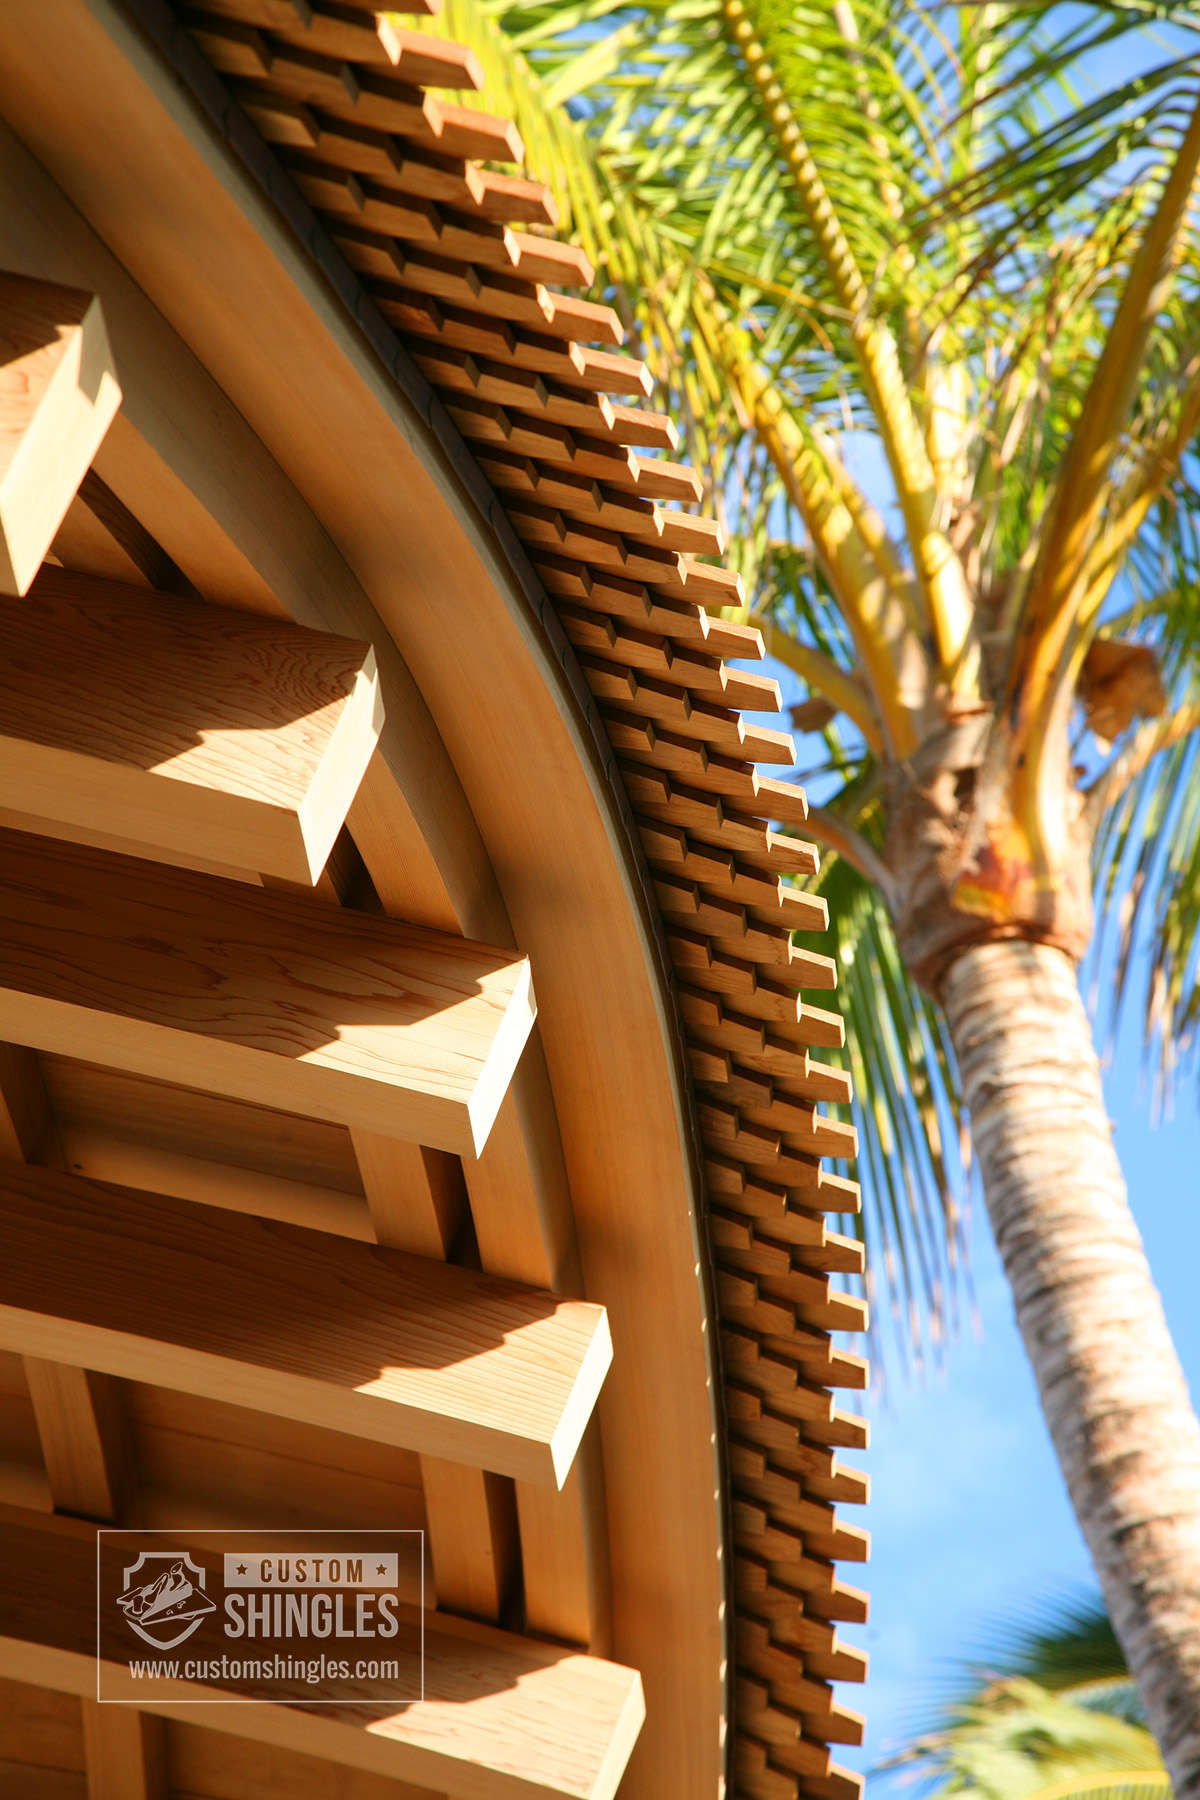 Kona,-Hawaii-Residence-with-Onsite-Steam-Bent-Teak-Shingles-(D) copy.jpg